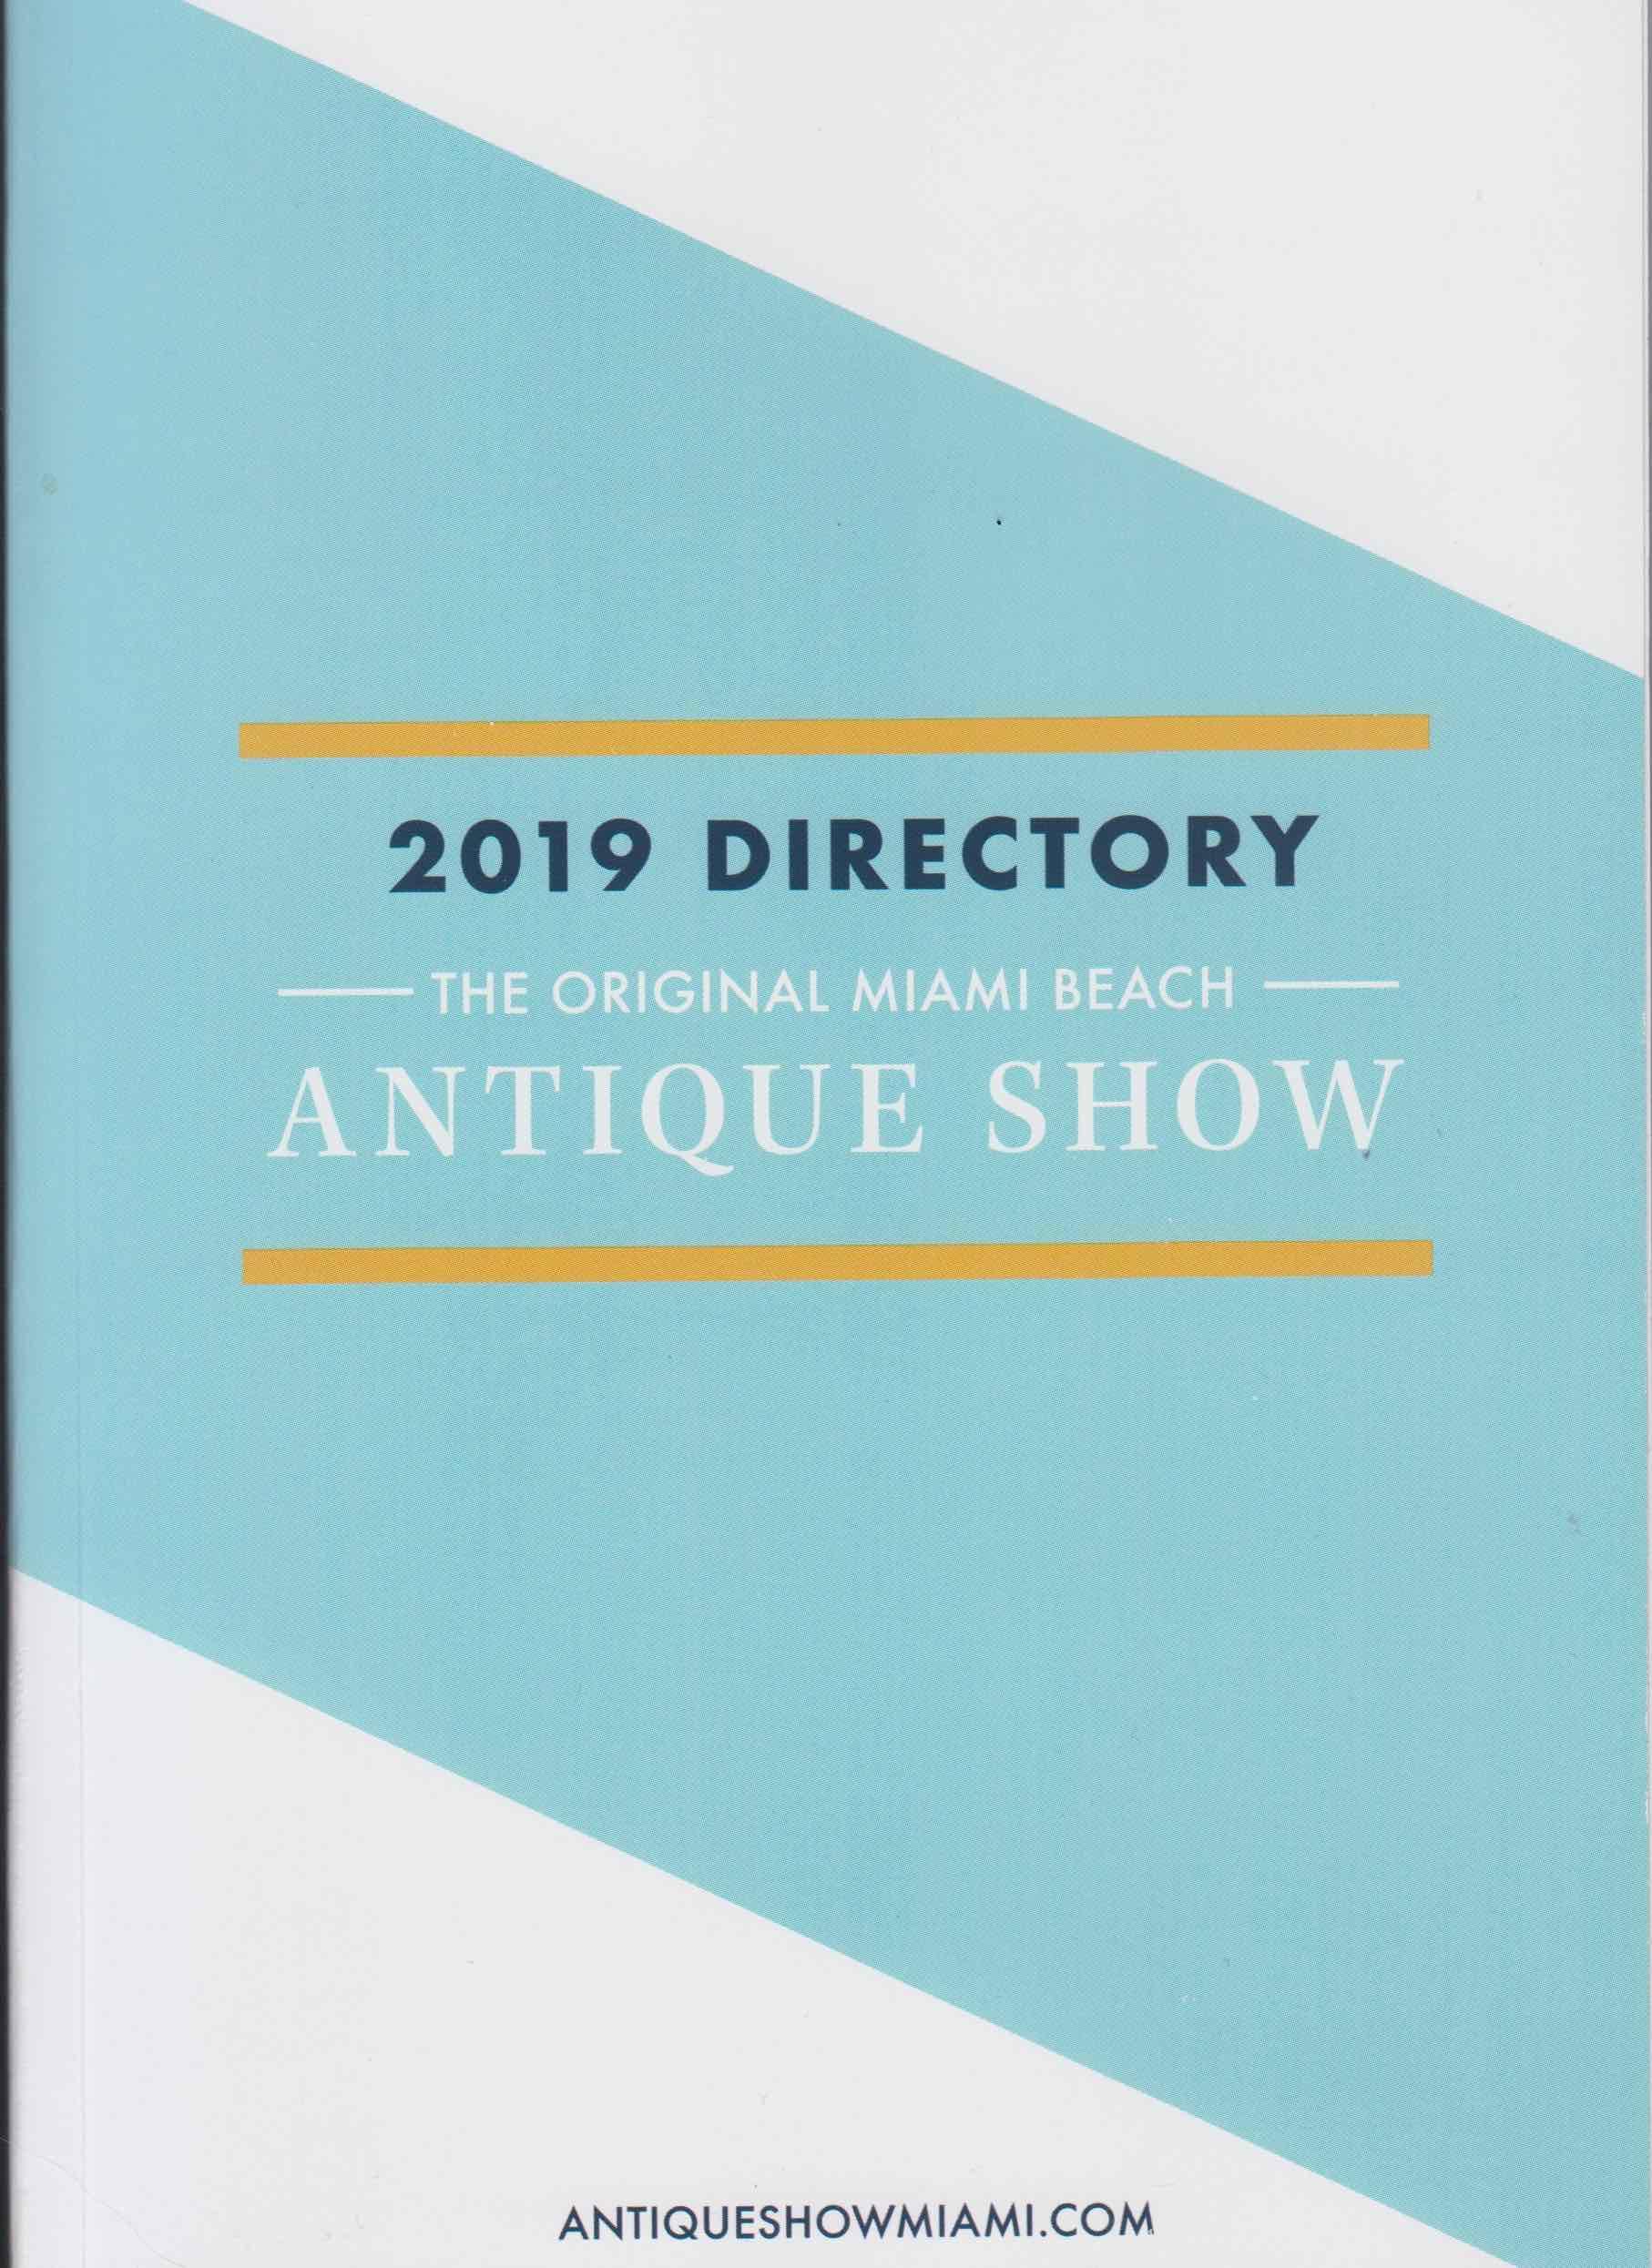 January 26, 2019, Ruby Lane Sponsors, The 2019 Original Miami Beach Antique Show image 1